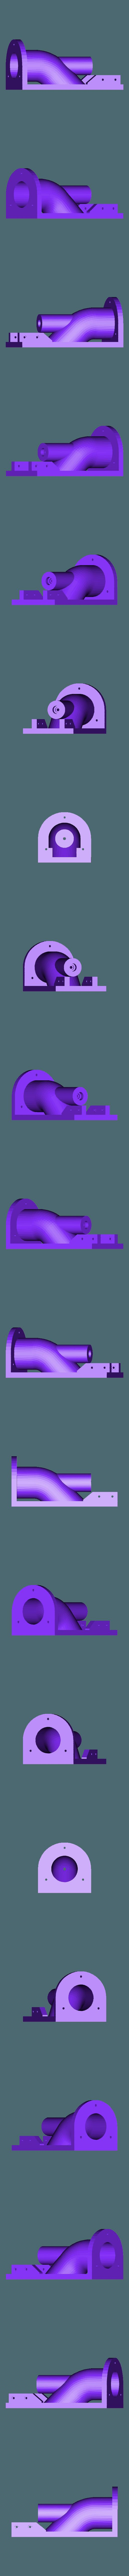 3mm_Shaft_Jethousing.stl Download free STL file Water Jet for 540 Motors • 3D printable object, SeanTheITGuy